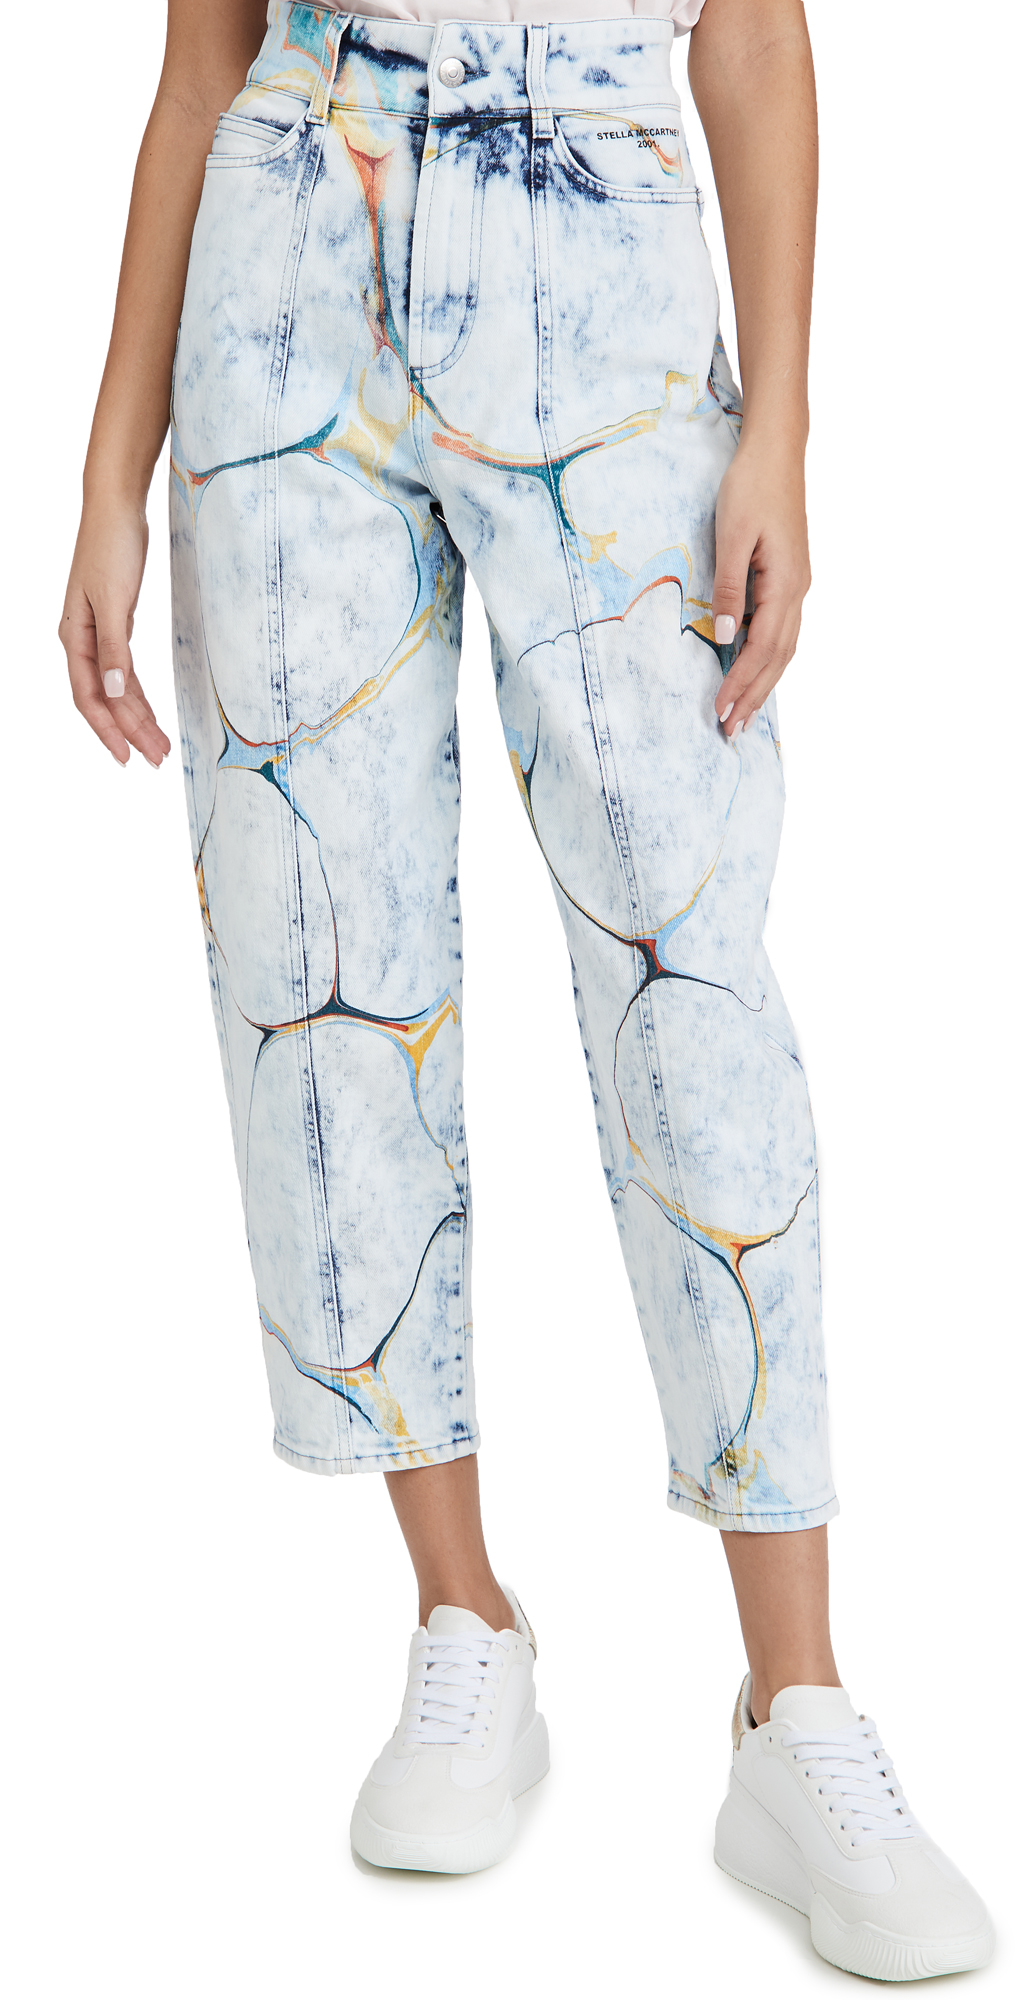 Stella McCartney High Rise Straight Leg Jeans